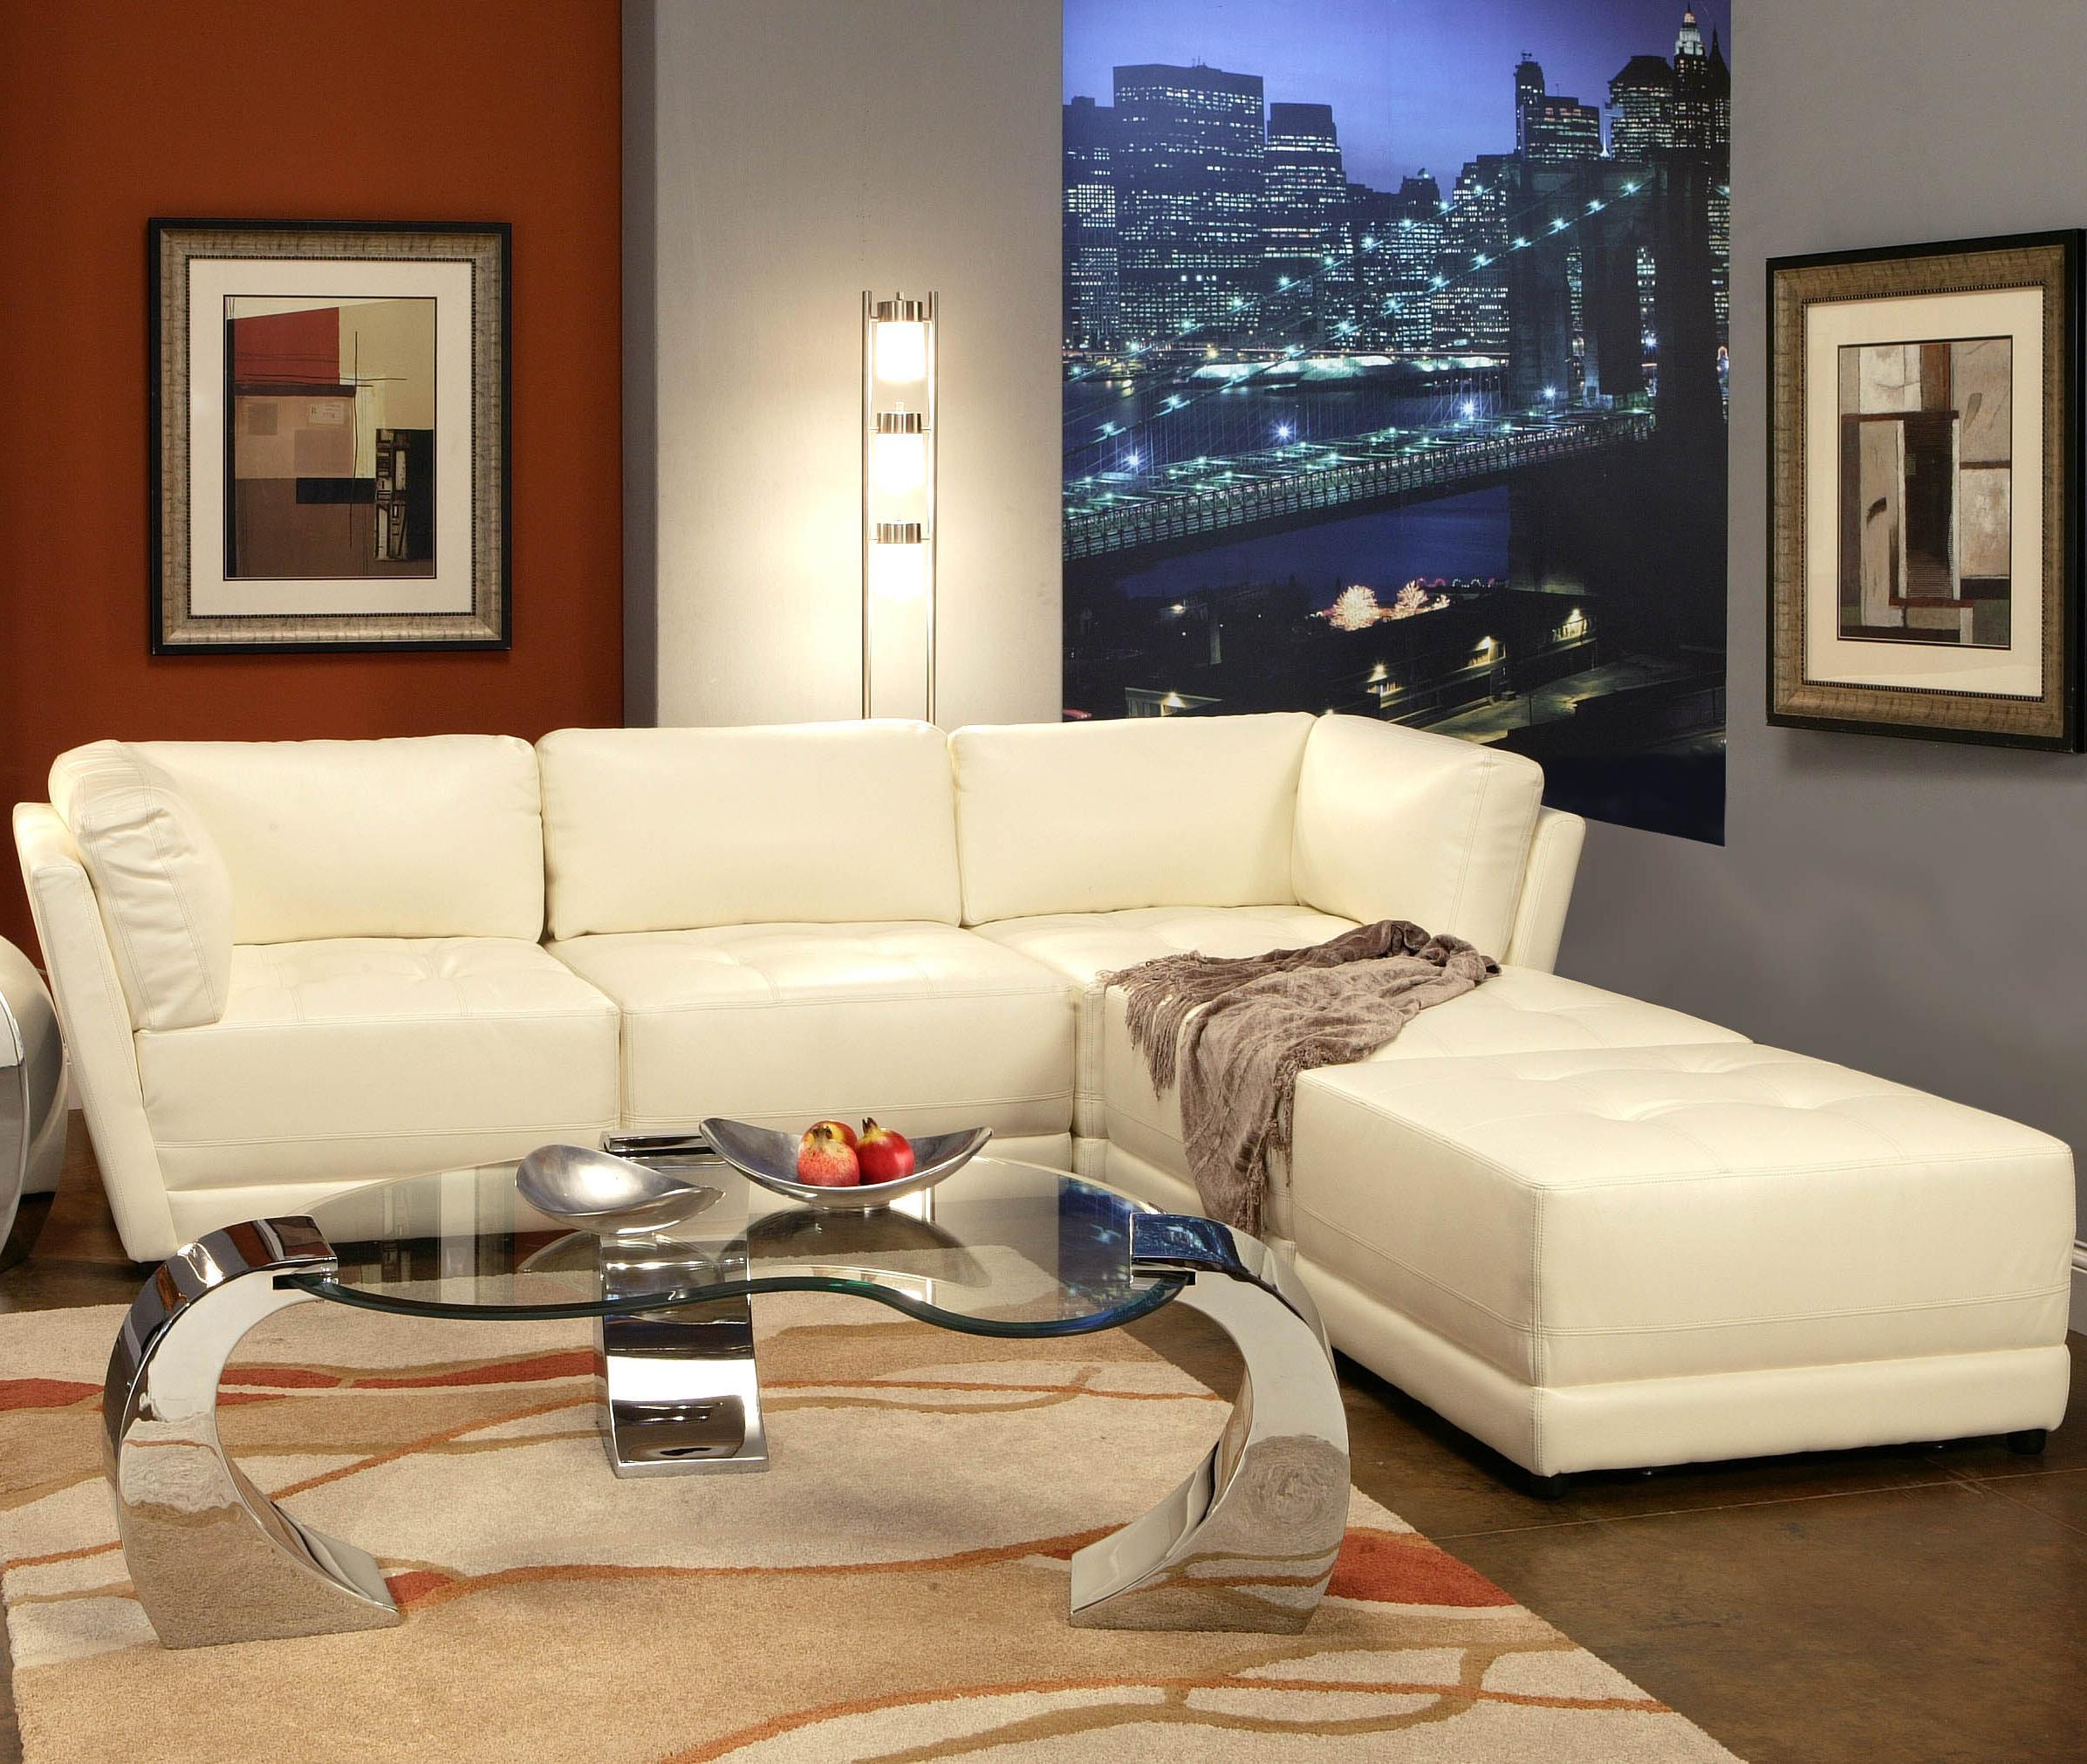 Lacomfy Furniture Store 1353 E Colorado St Glendale Ca 91205